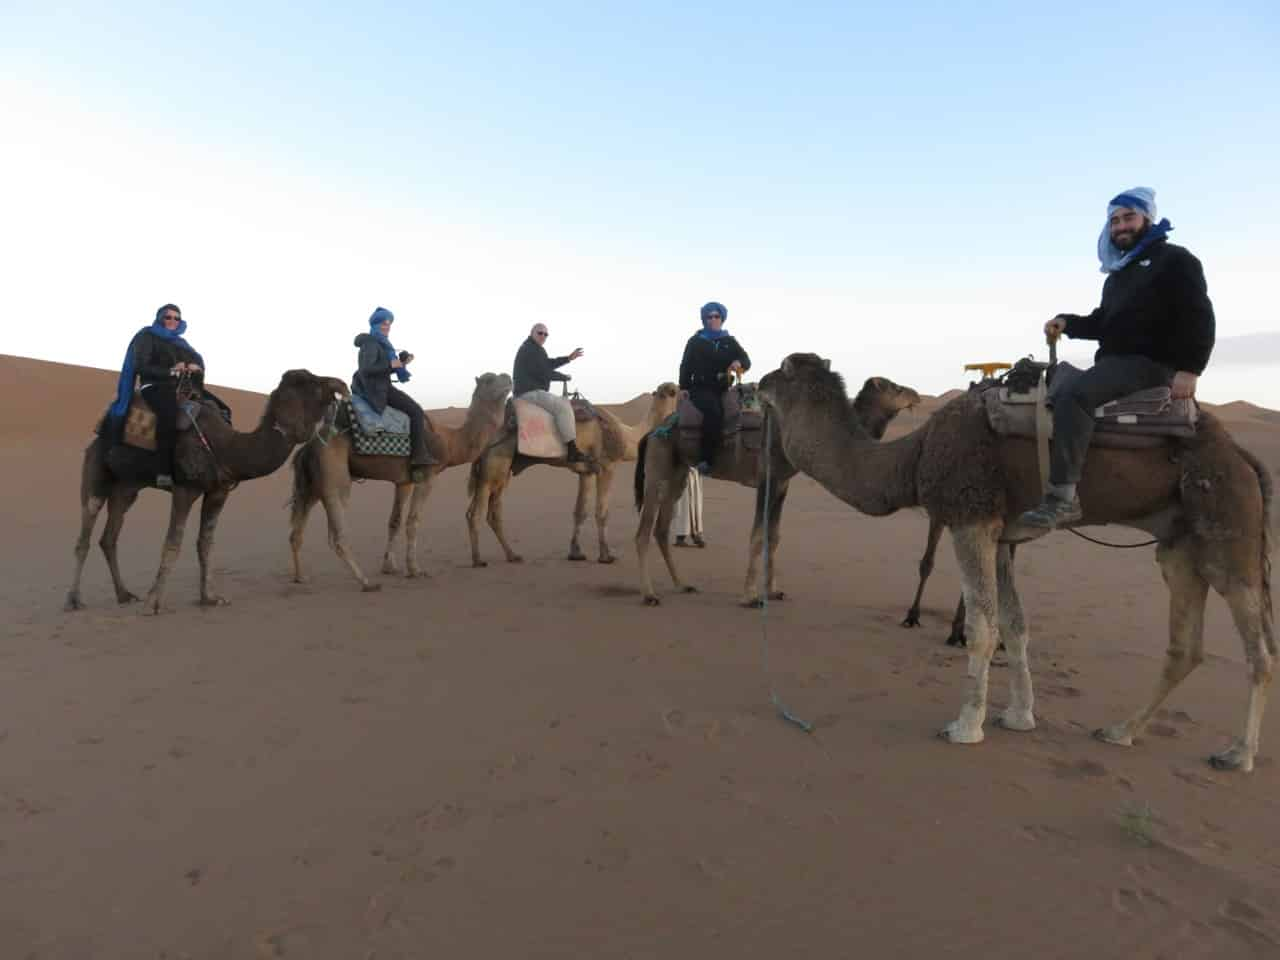 gordons-bond-on-camels-in-morocco